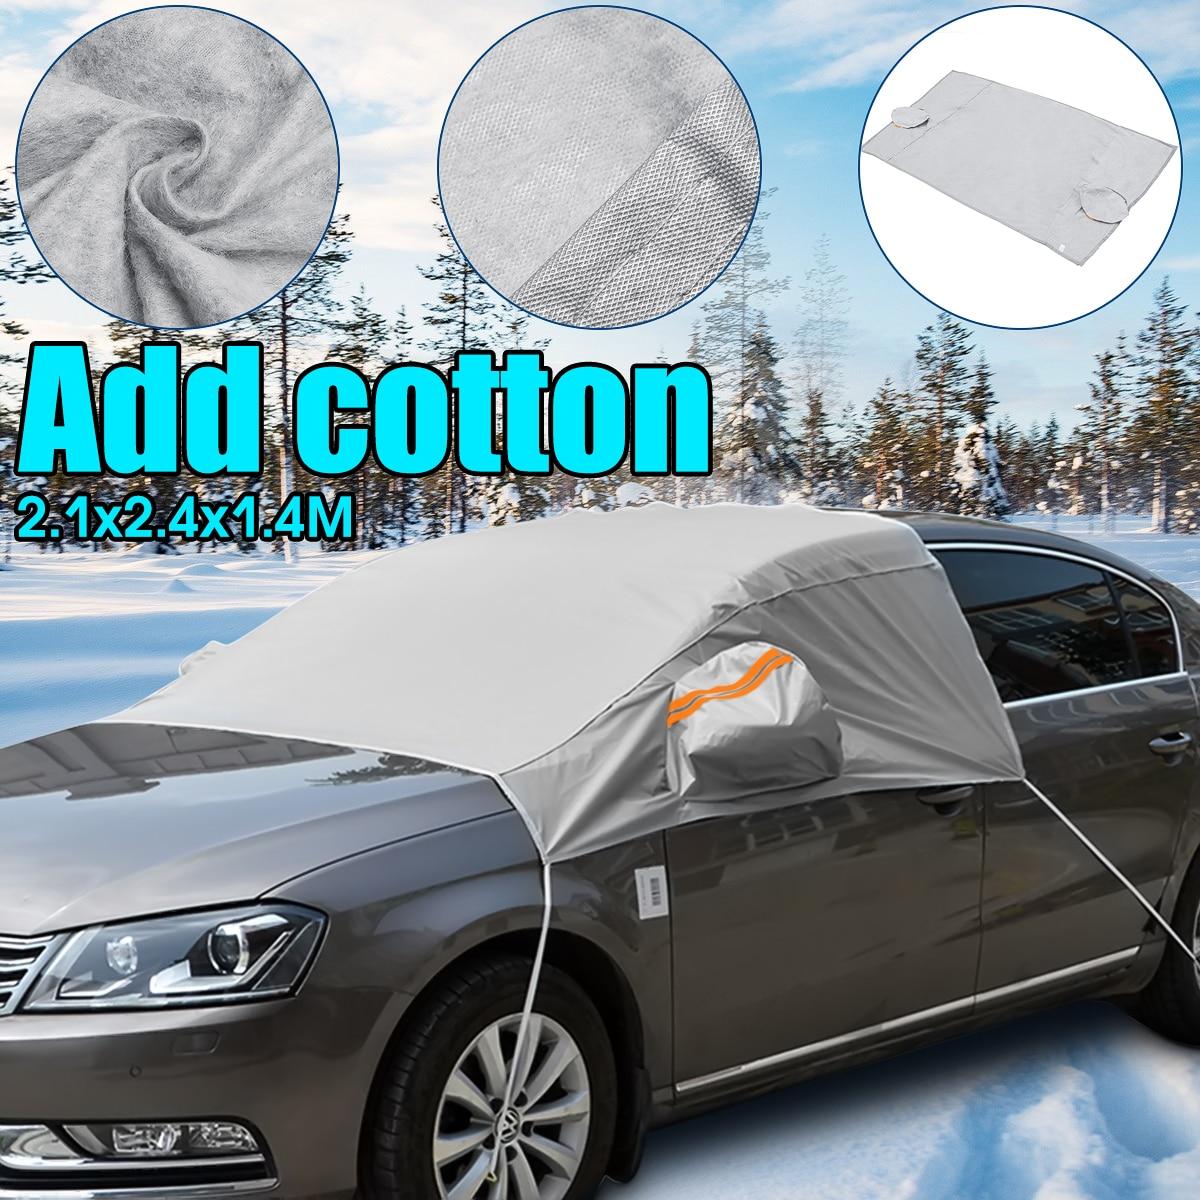 240cmx200cmx147cm Universal Car Front Window Windscreen Covers Sunshade Cover Snow UV Ice Shield for Windshield Winter Summer